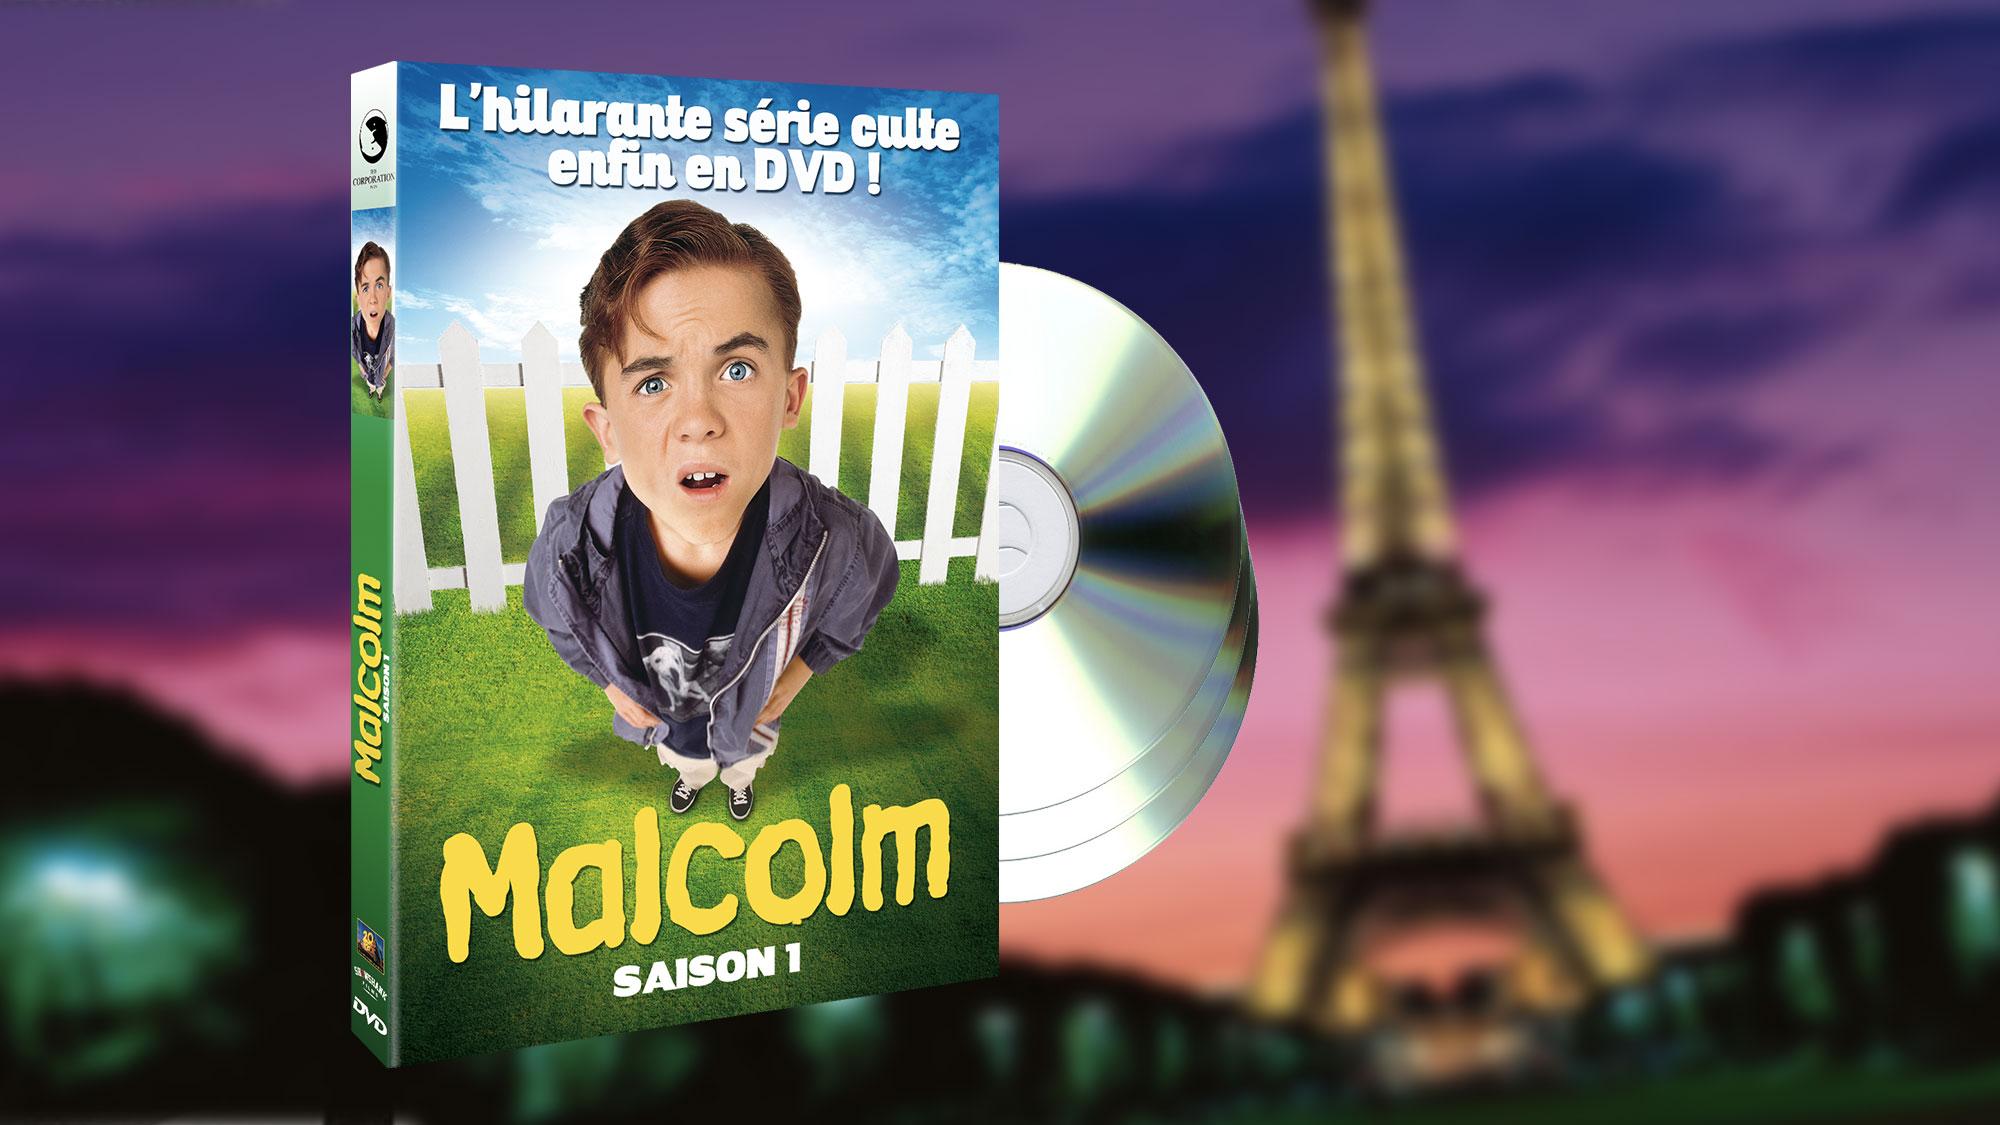 La saison 1 de <em>Malcolm</em> sortira en DVD en mars 2014